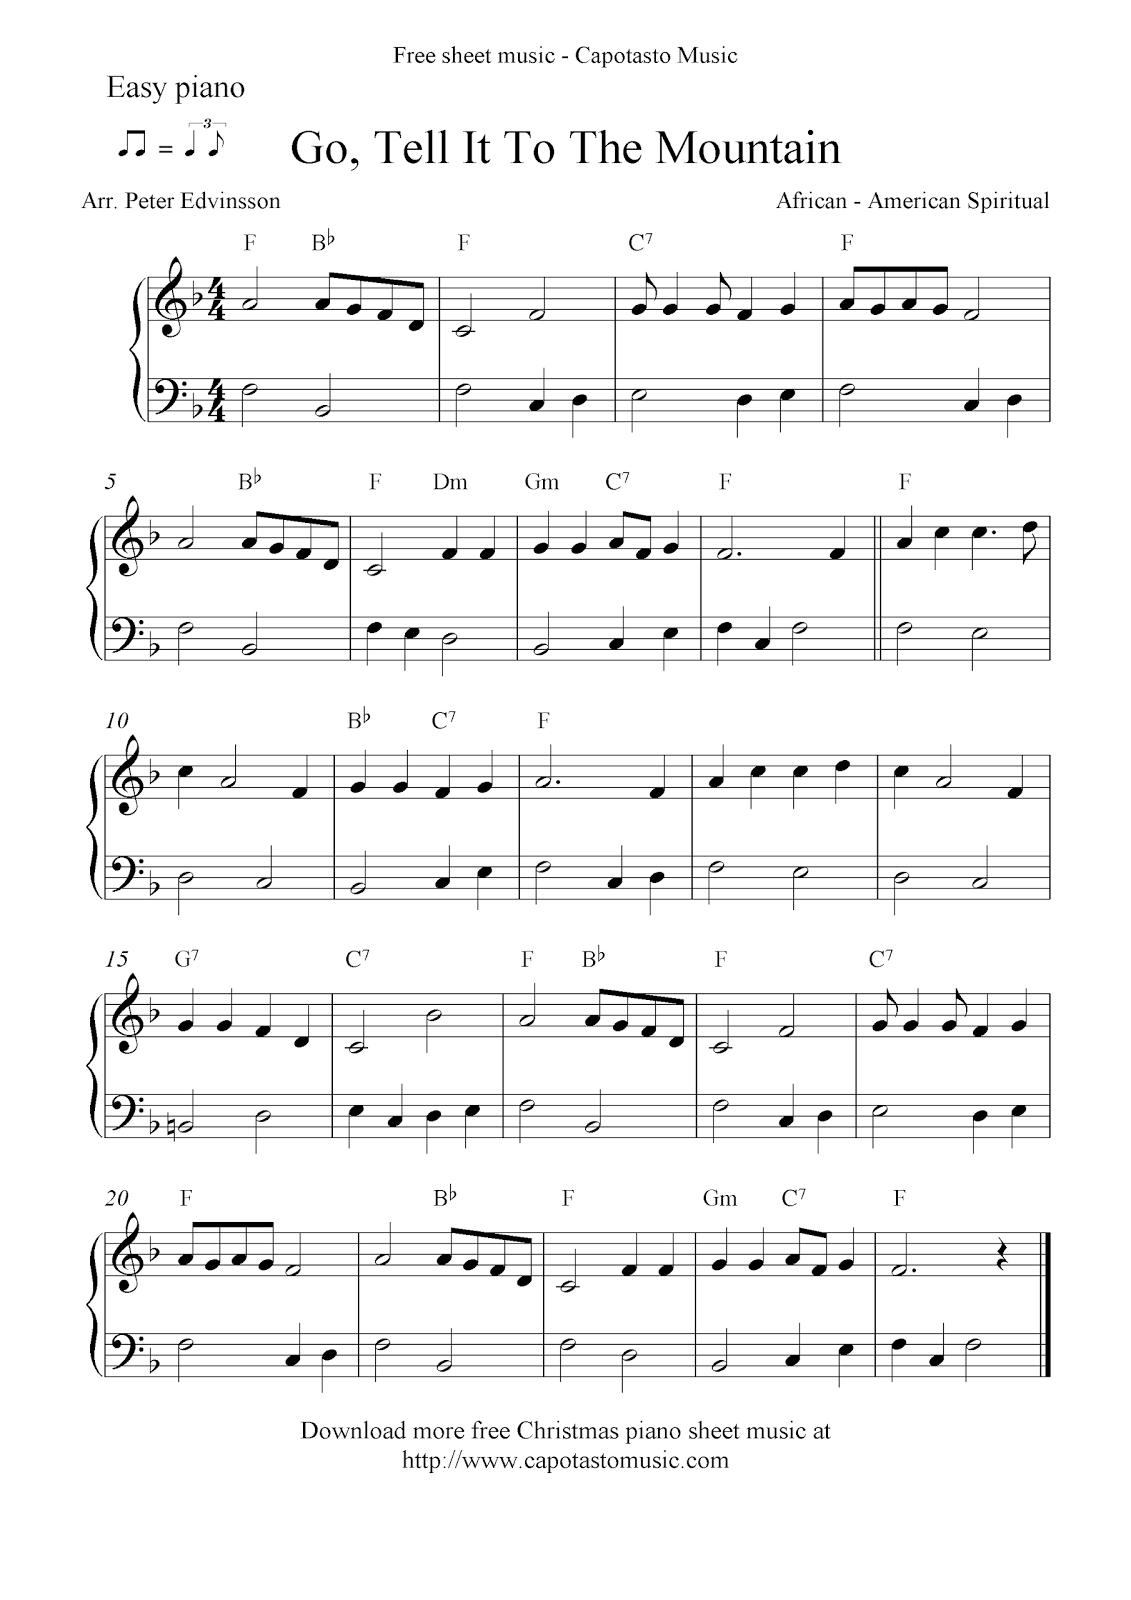 Easy Free Christmas Piano Sheet Music Notes, Go, Tell It To The Mountain - Christmas Piano Sheet Music Easy Free Printable